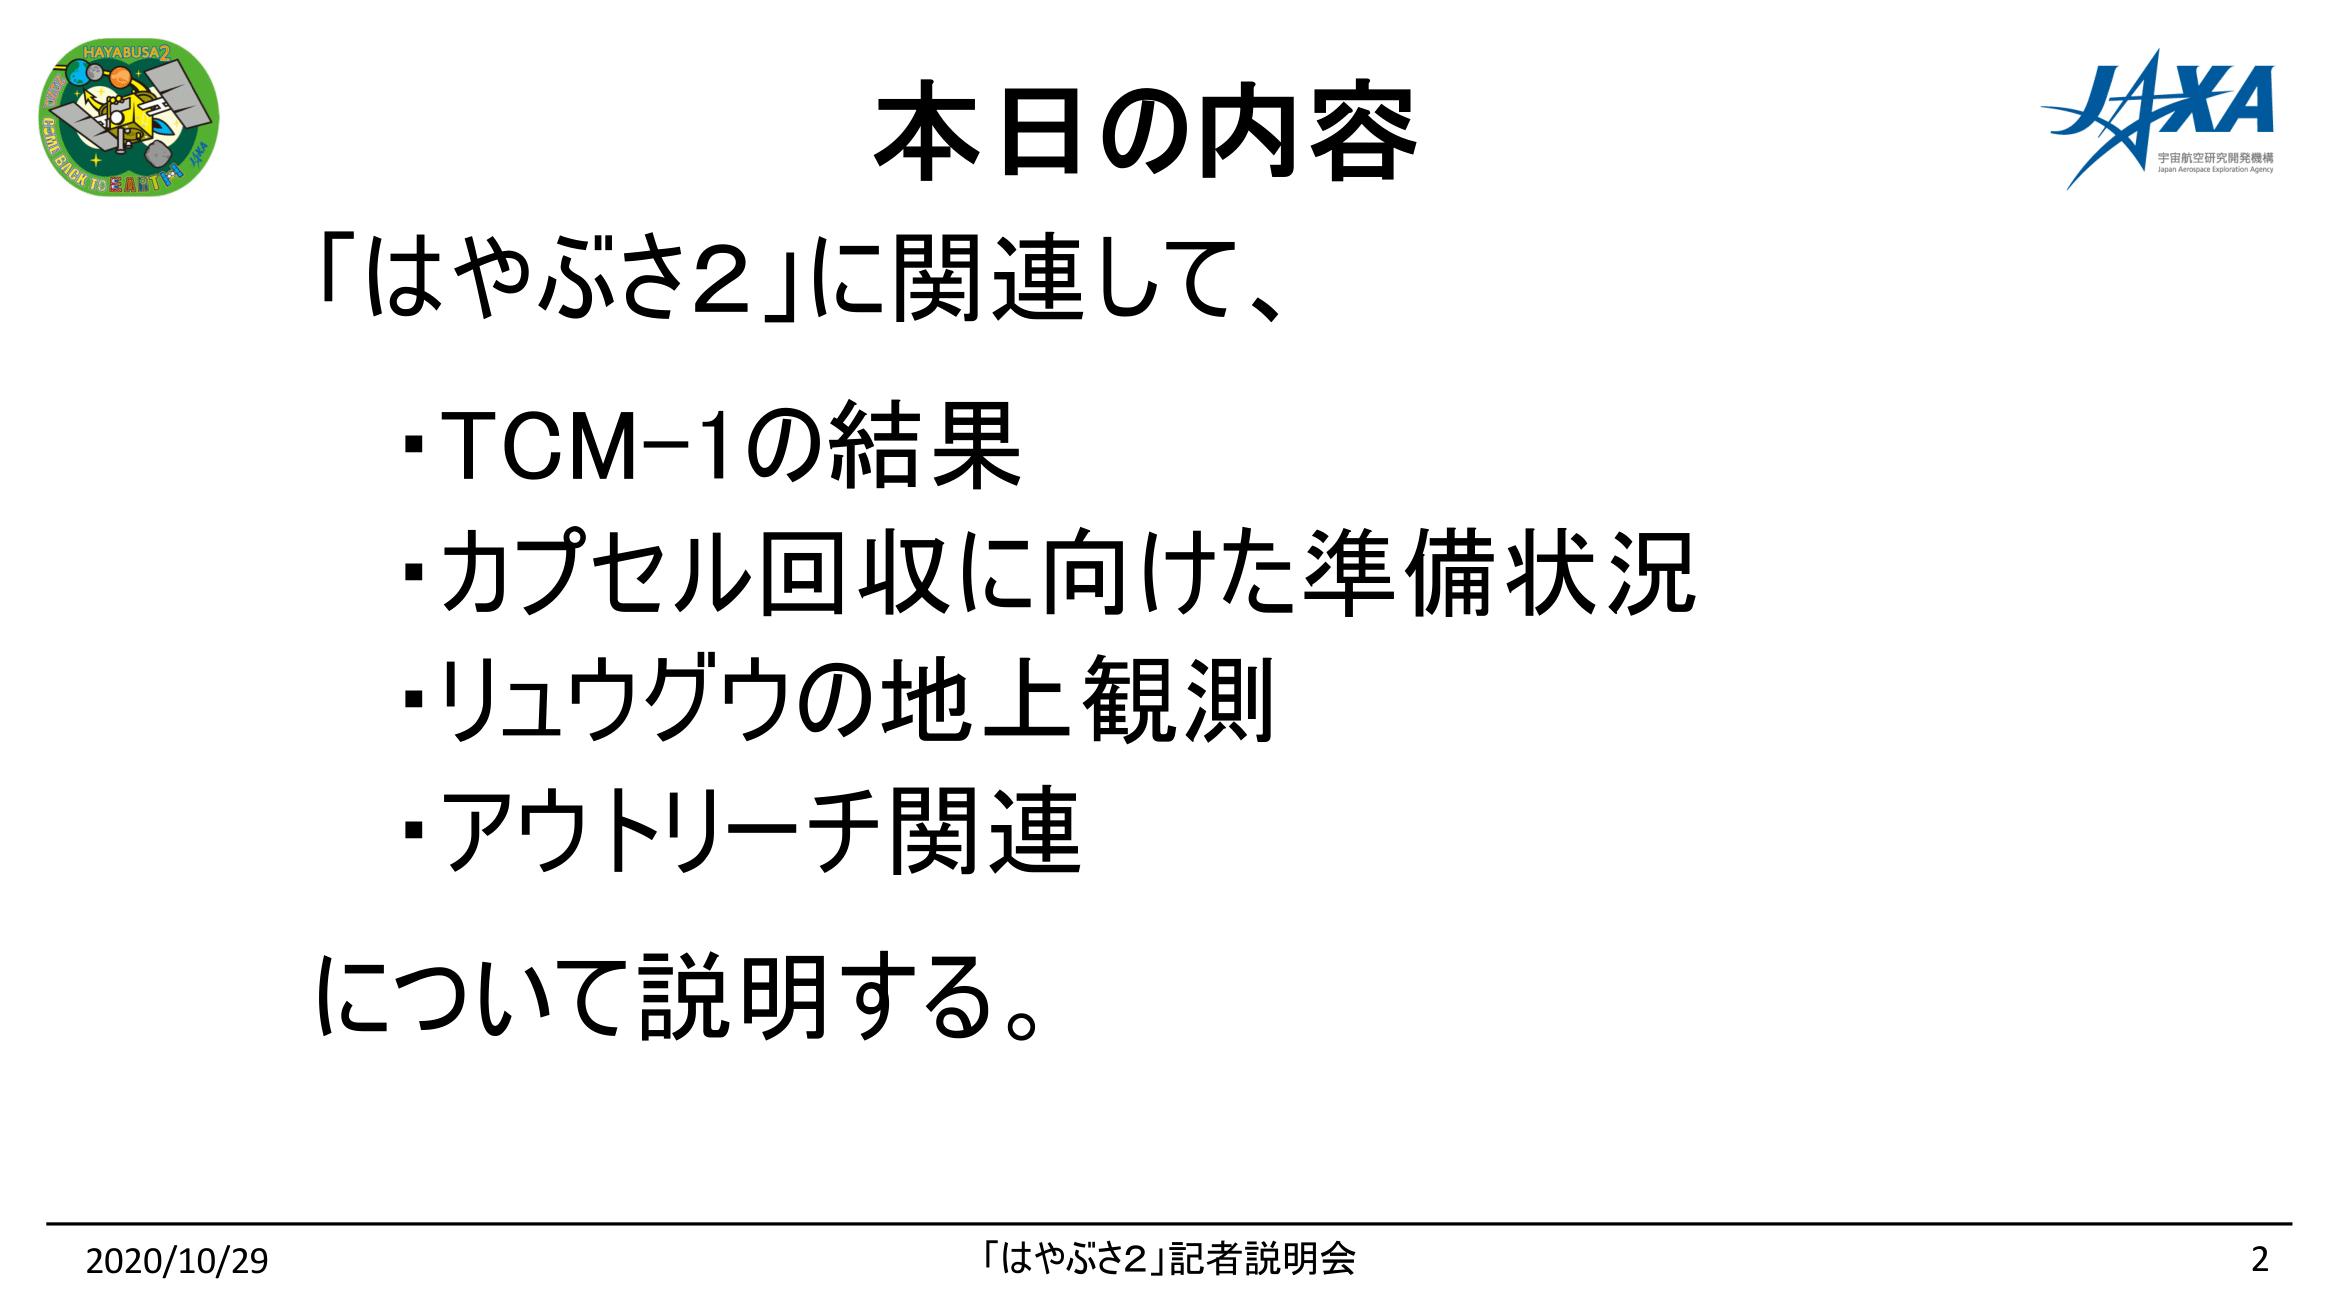 f:id:Imamura:20201029161203p:plain